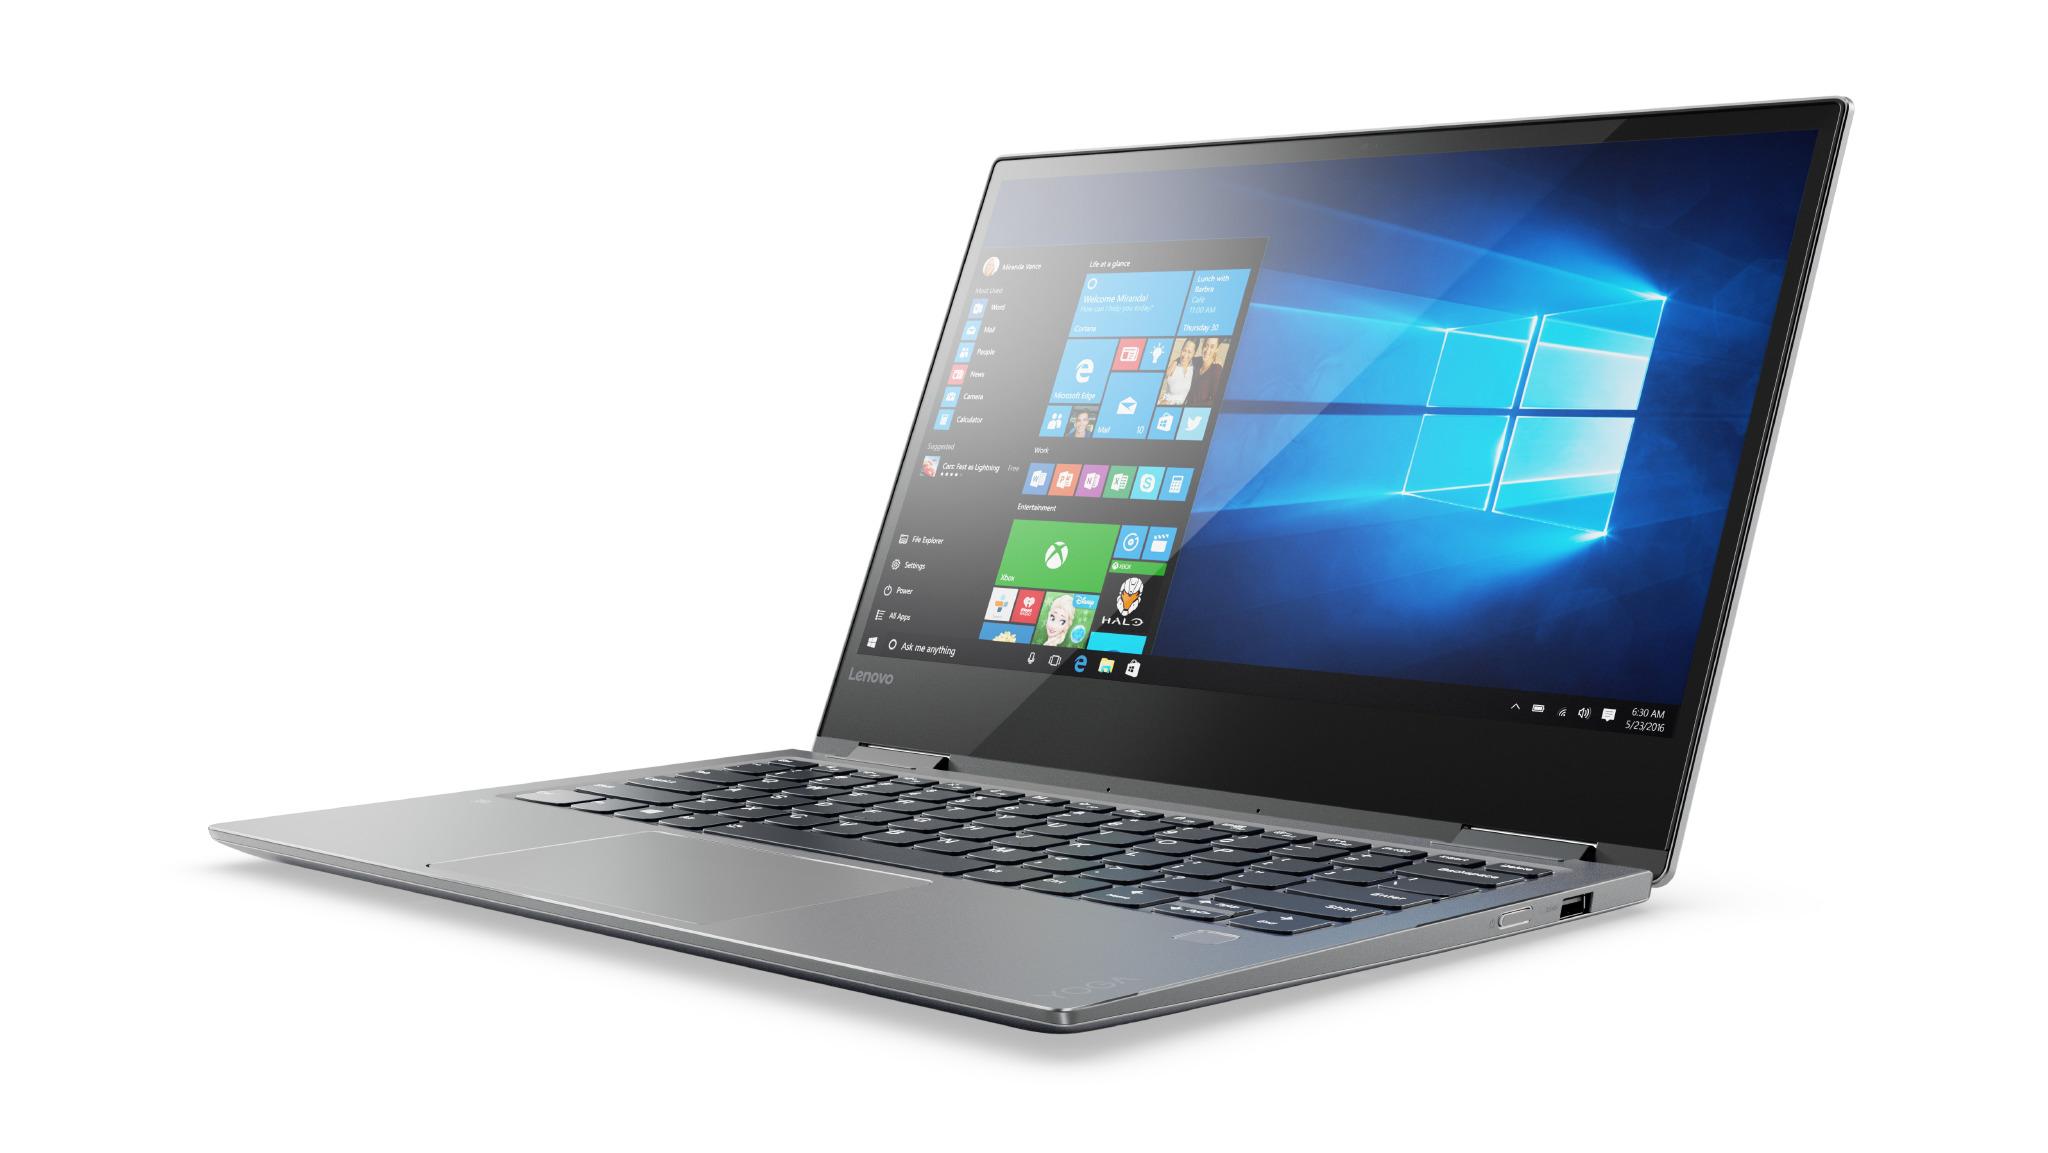 Lenovo YOGA 720 13.3 FHD T/i5-8250U/8/256G/INT/W10H šedý